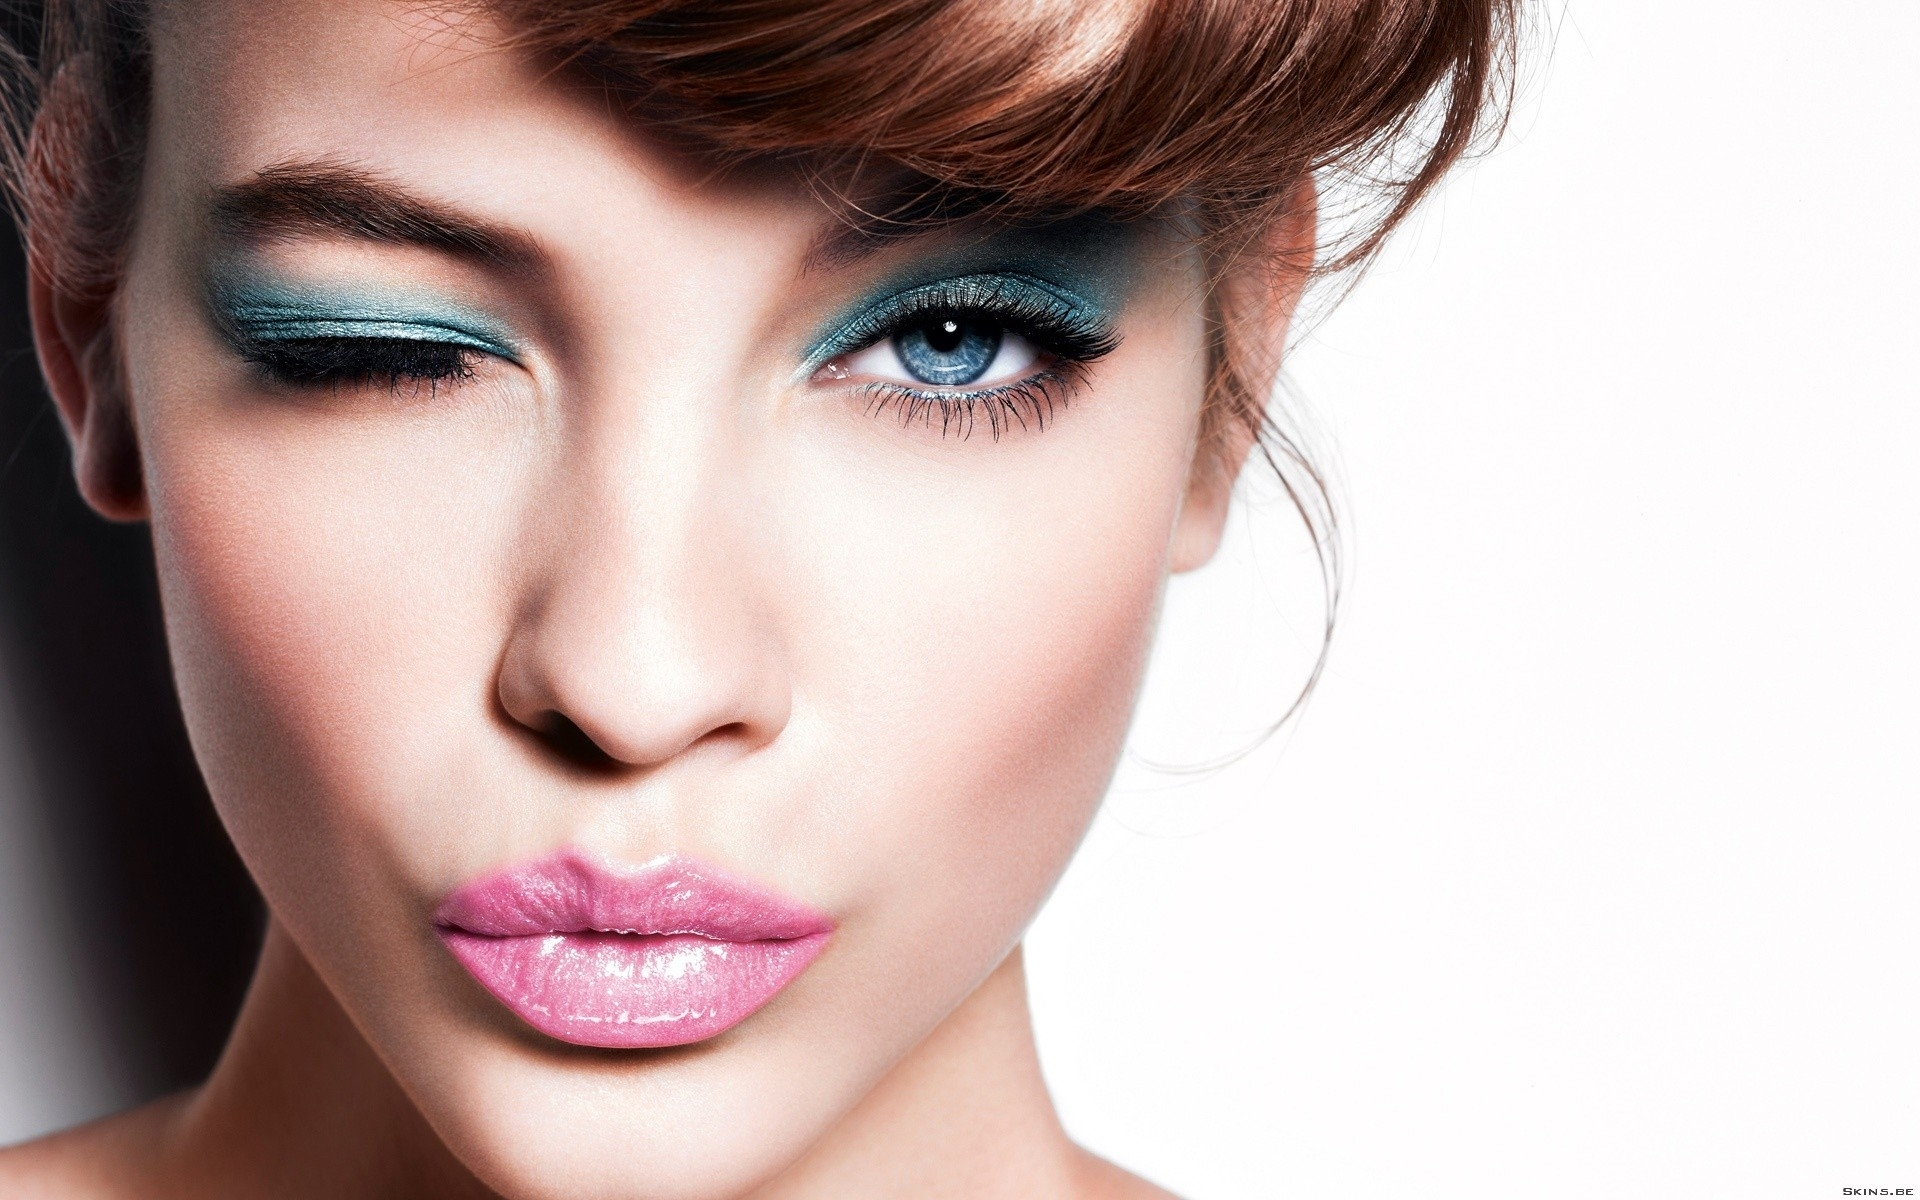 eye-makeup-and-lips-1866